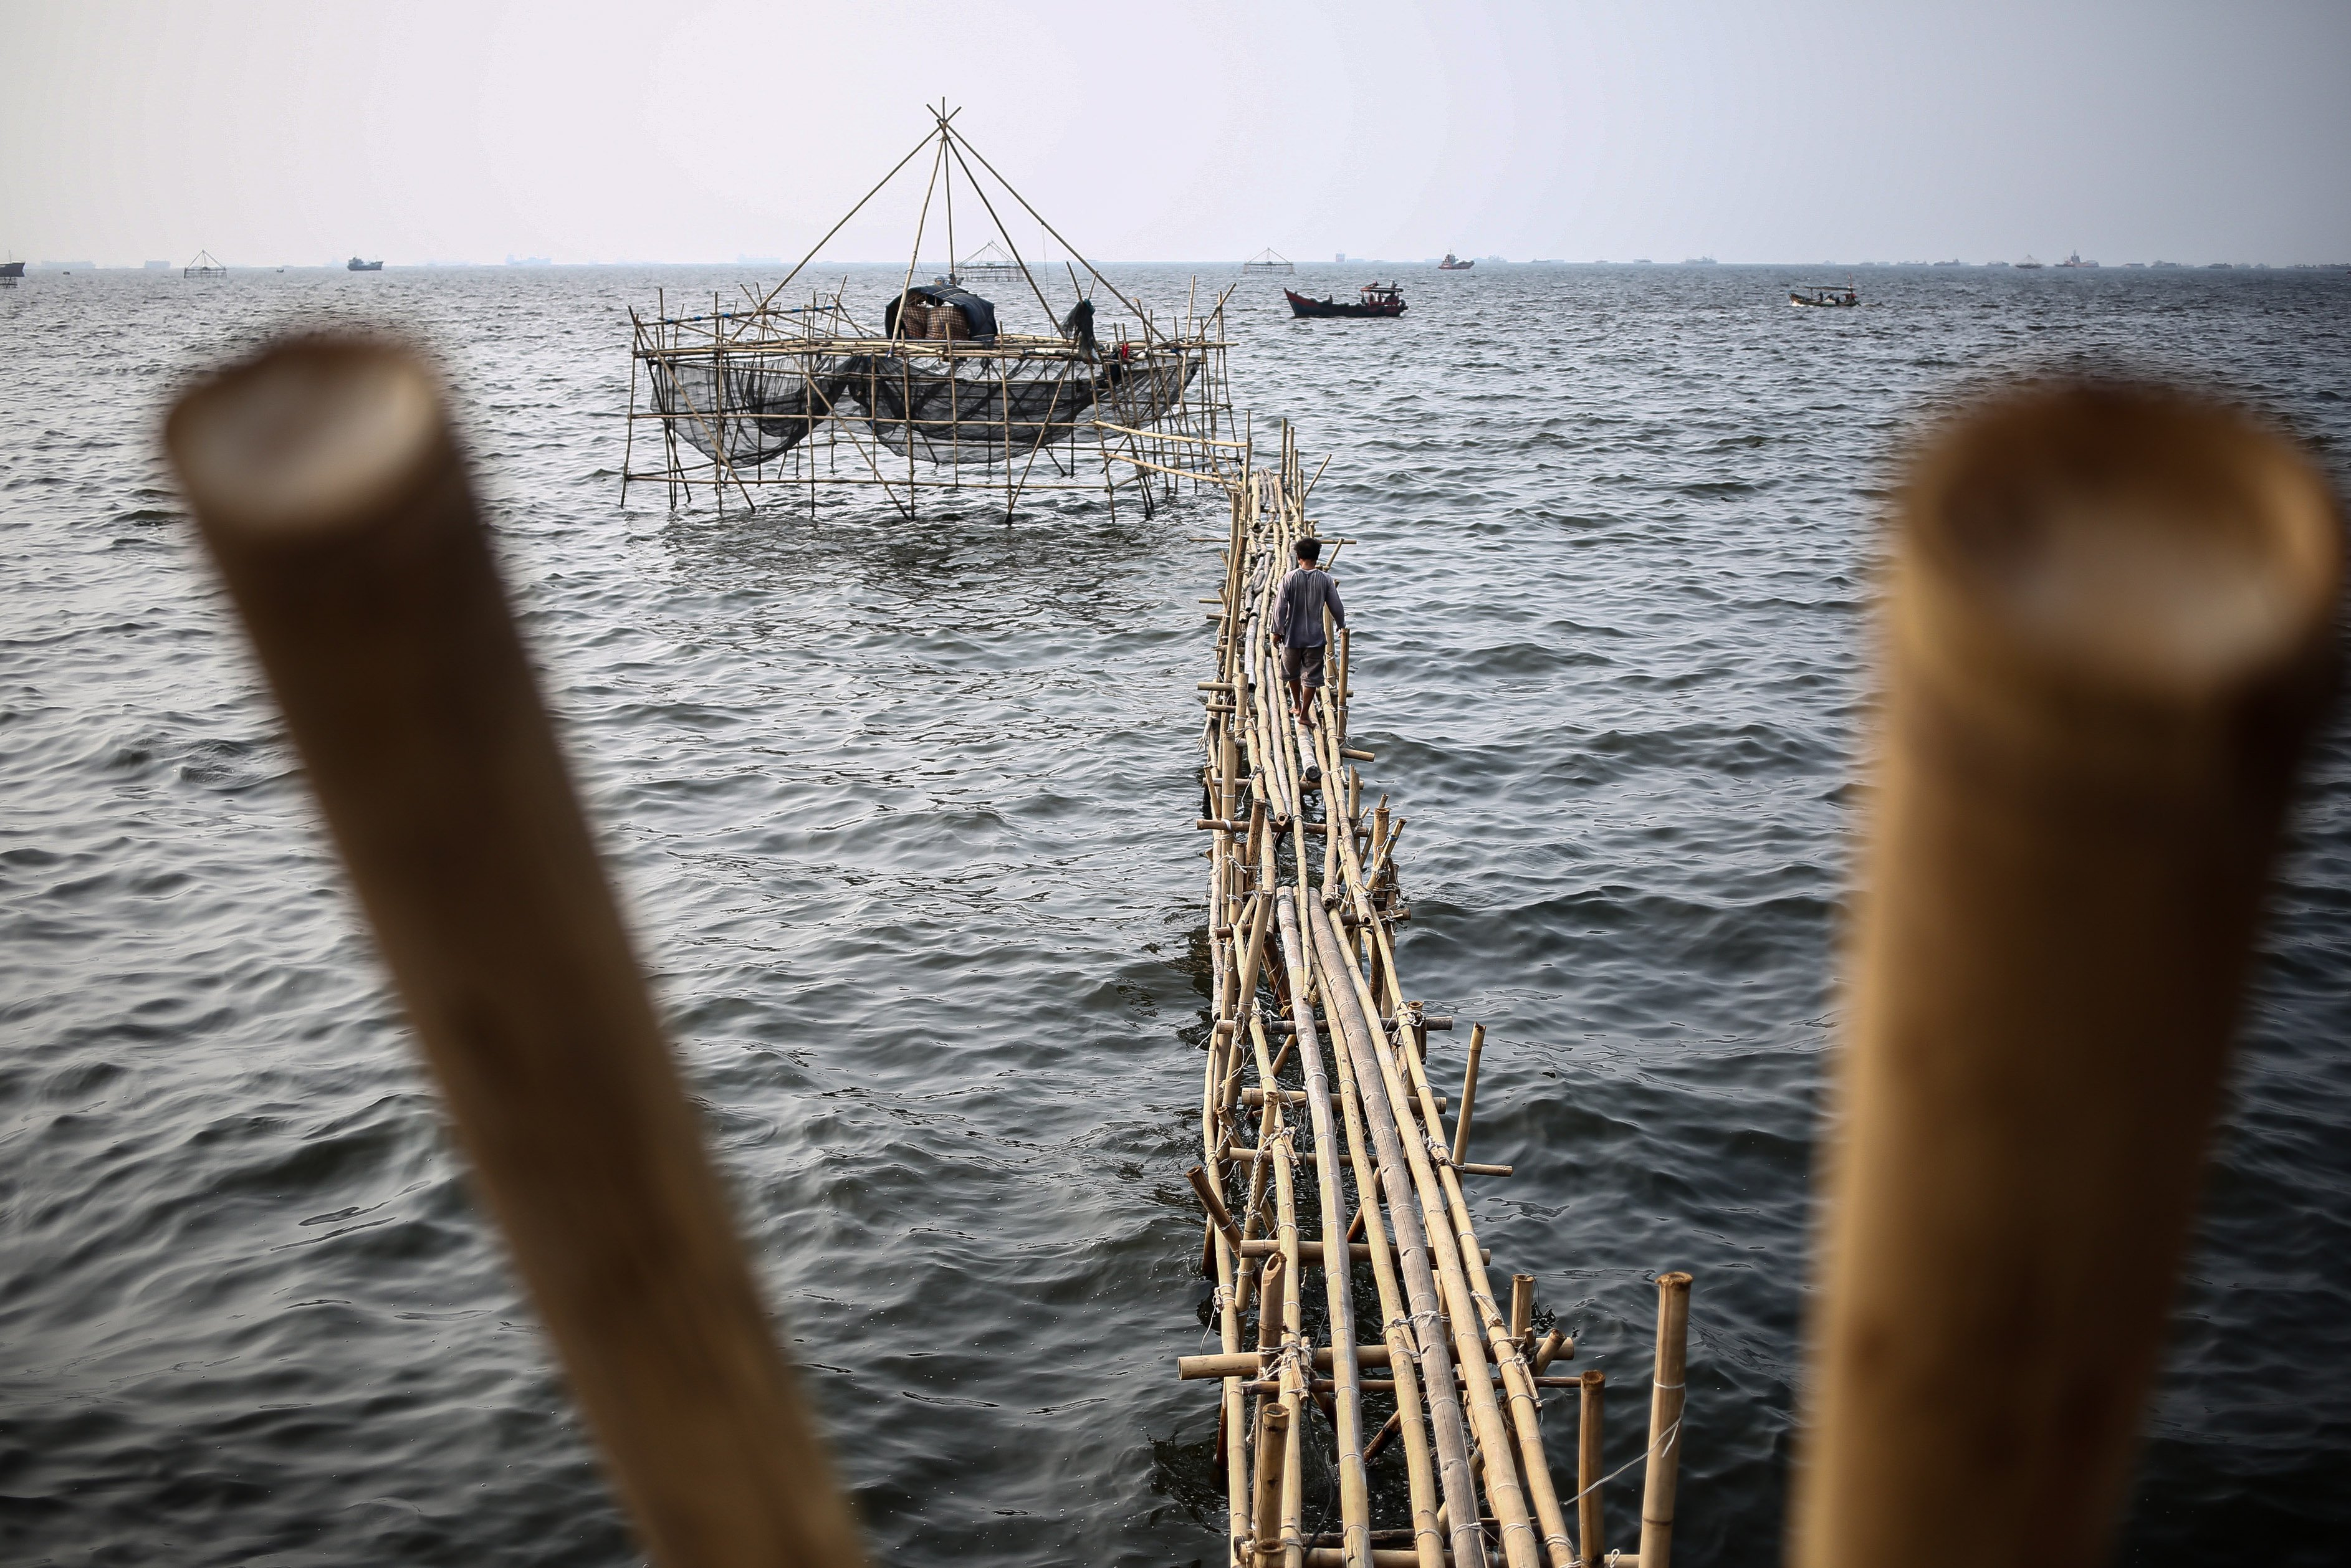 Seorang nelayan berjalan menuju bagan, alat menangkap kerang di Kampung Nelayan, Jakarta Utara, Minggu (9/8/2020). Kesatuan Nelayan Tradisional Indonesia (KNTI) mengklaim penurunan penjualan tangkapan nelayan mencapai 21 persen dan pendapatan hingga 90 persen akibat merebaknya virus covid-19.